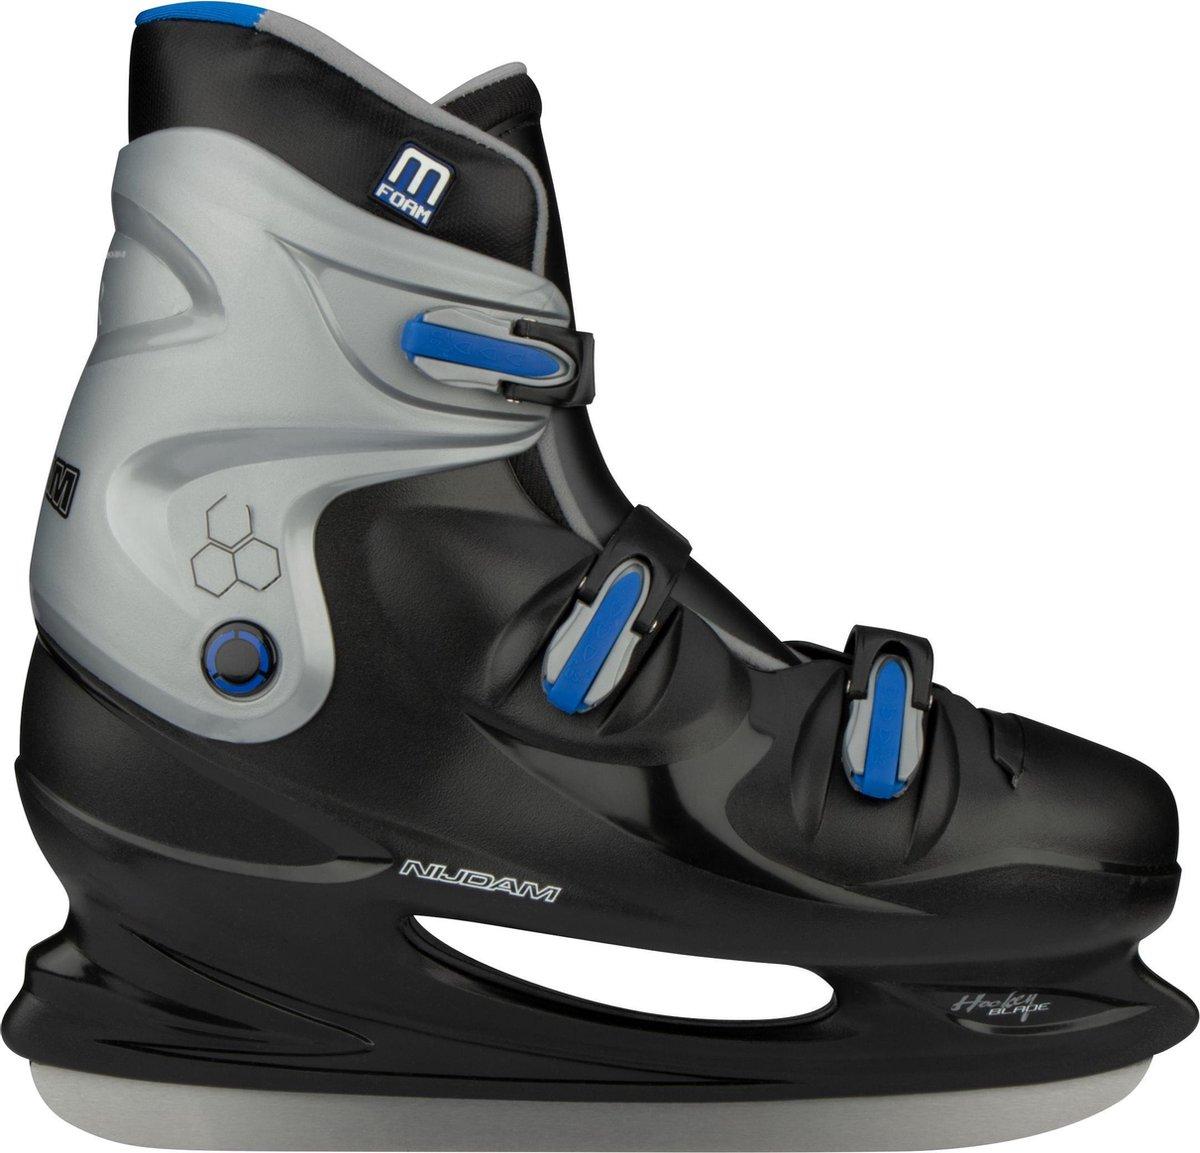 Nijdam IJshockeyschaats XXL - Hardboot - Zwart/Zilver/Blauw - 49